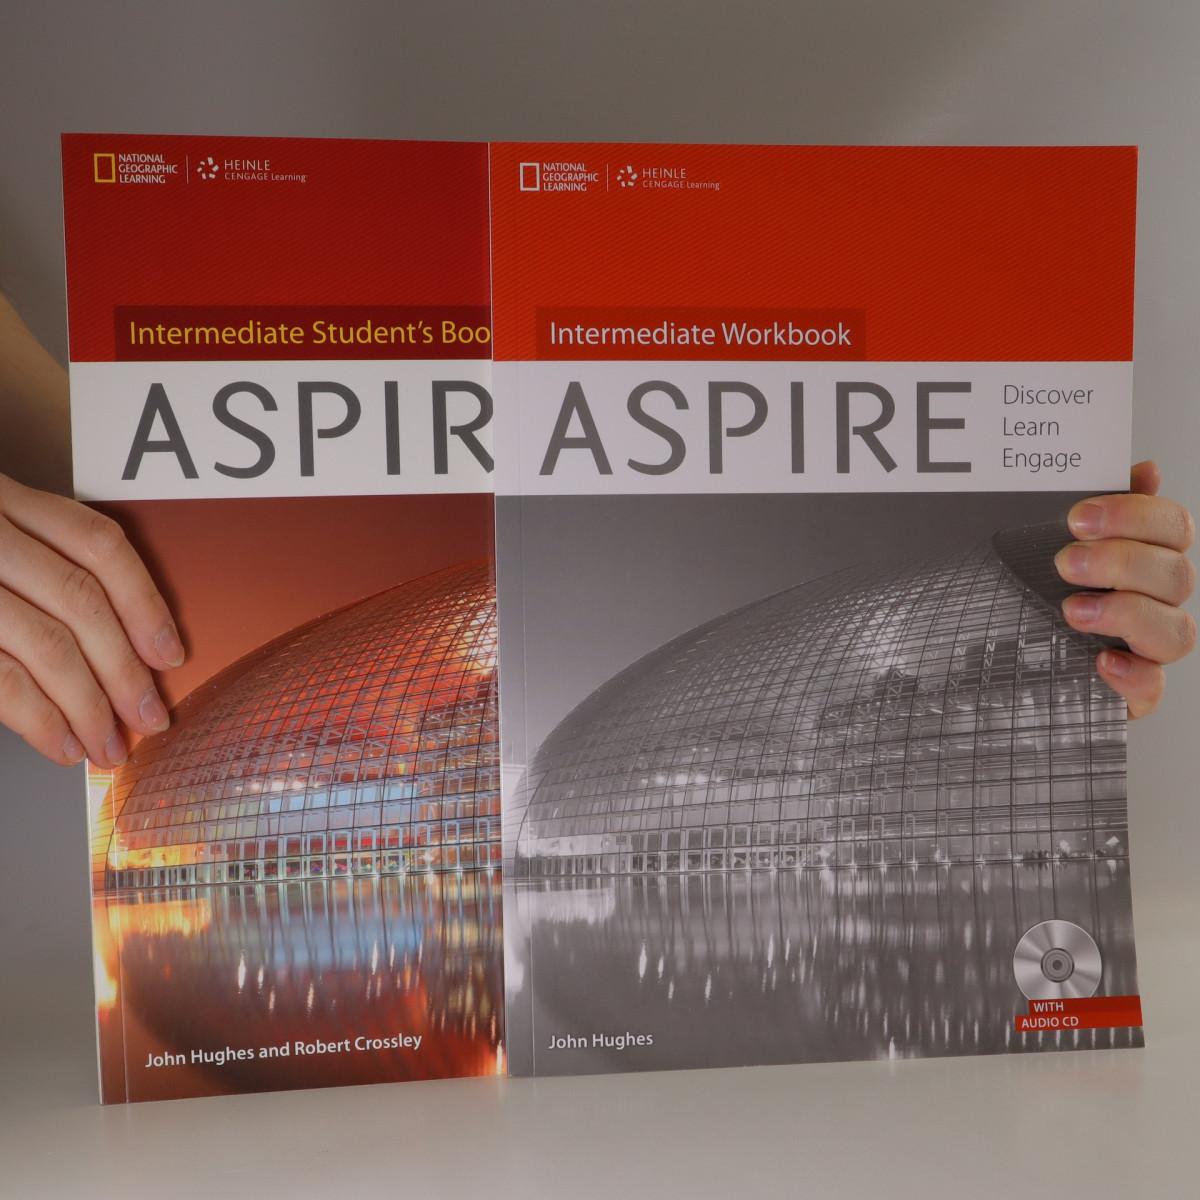 antikvární kniha Aspire. Discover, Learn, Engage. Intermediate Student's book. Intermediate Workbook (2 svazky), 2013